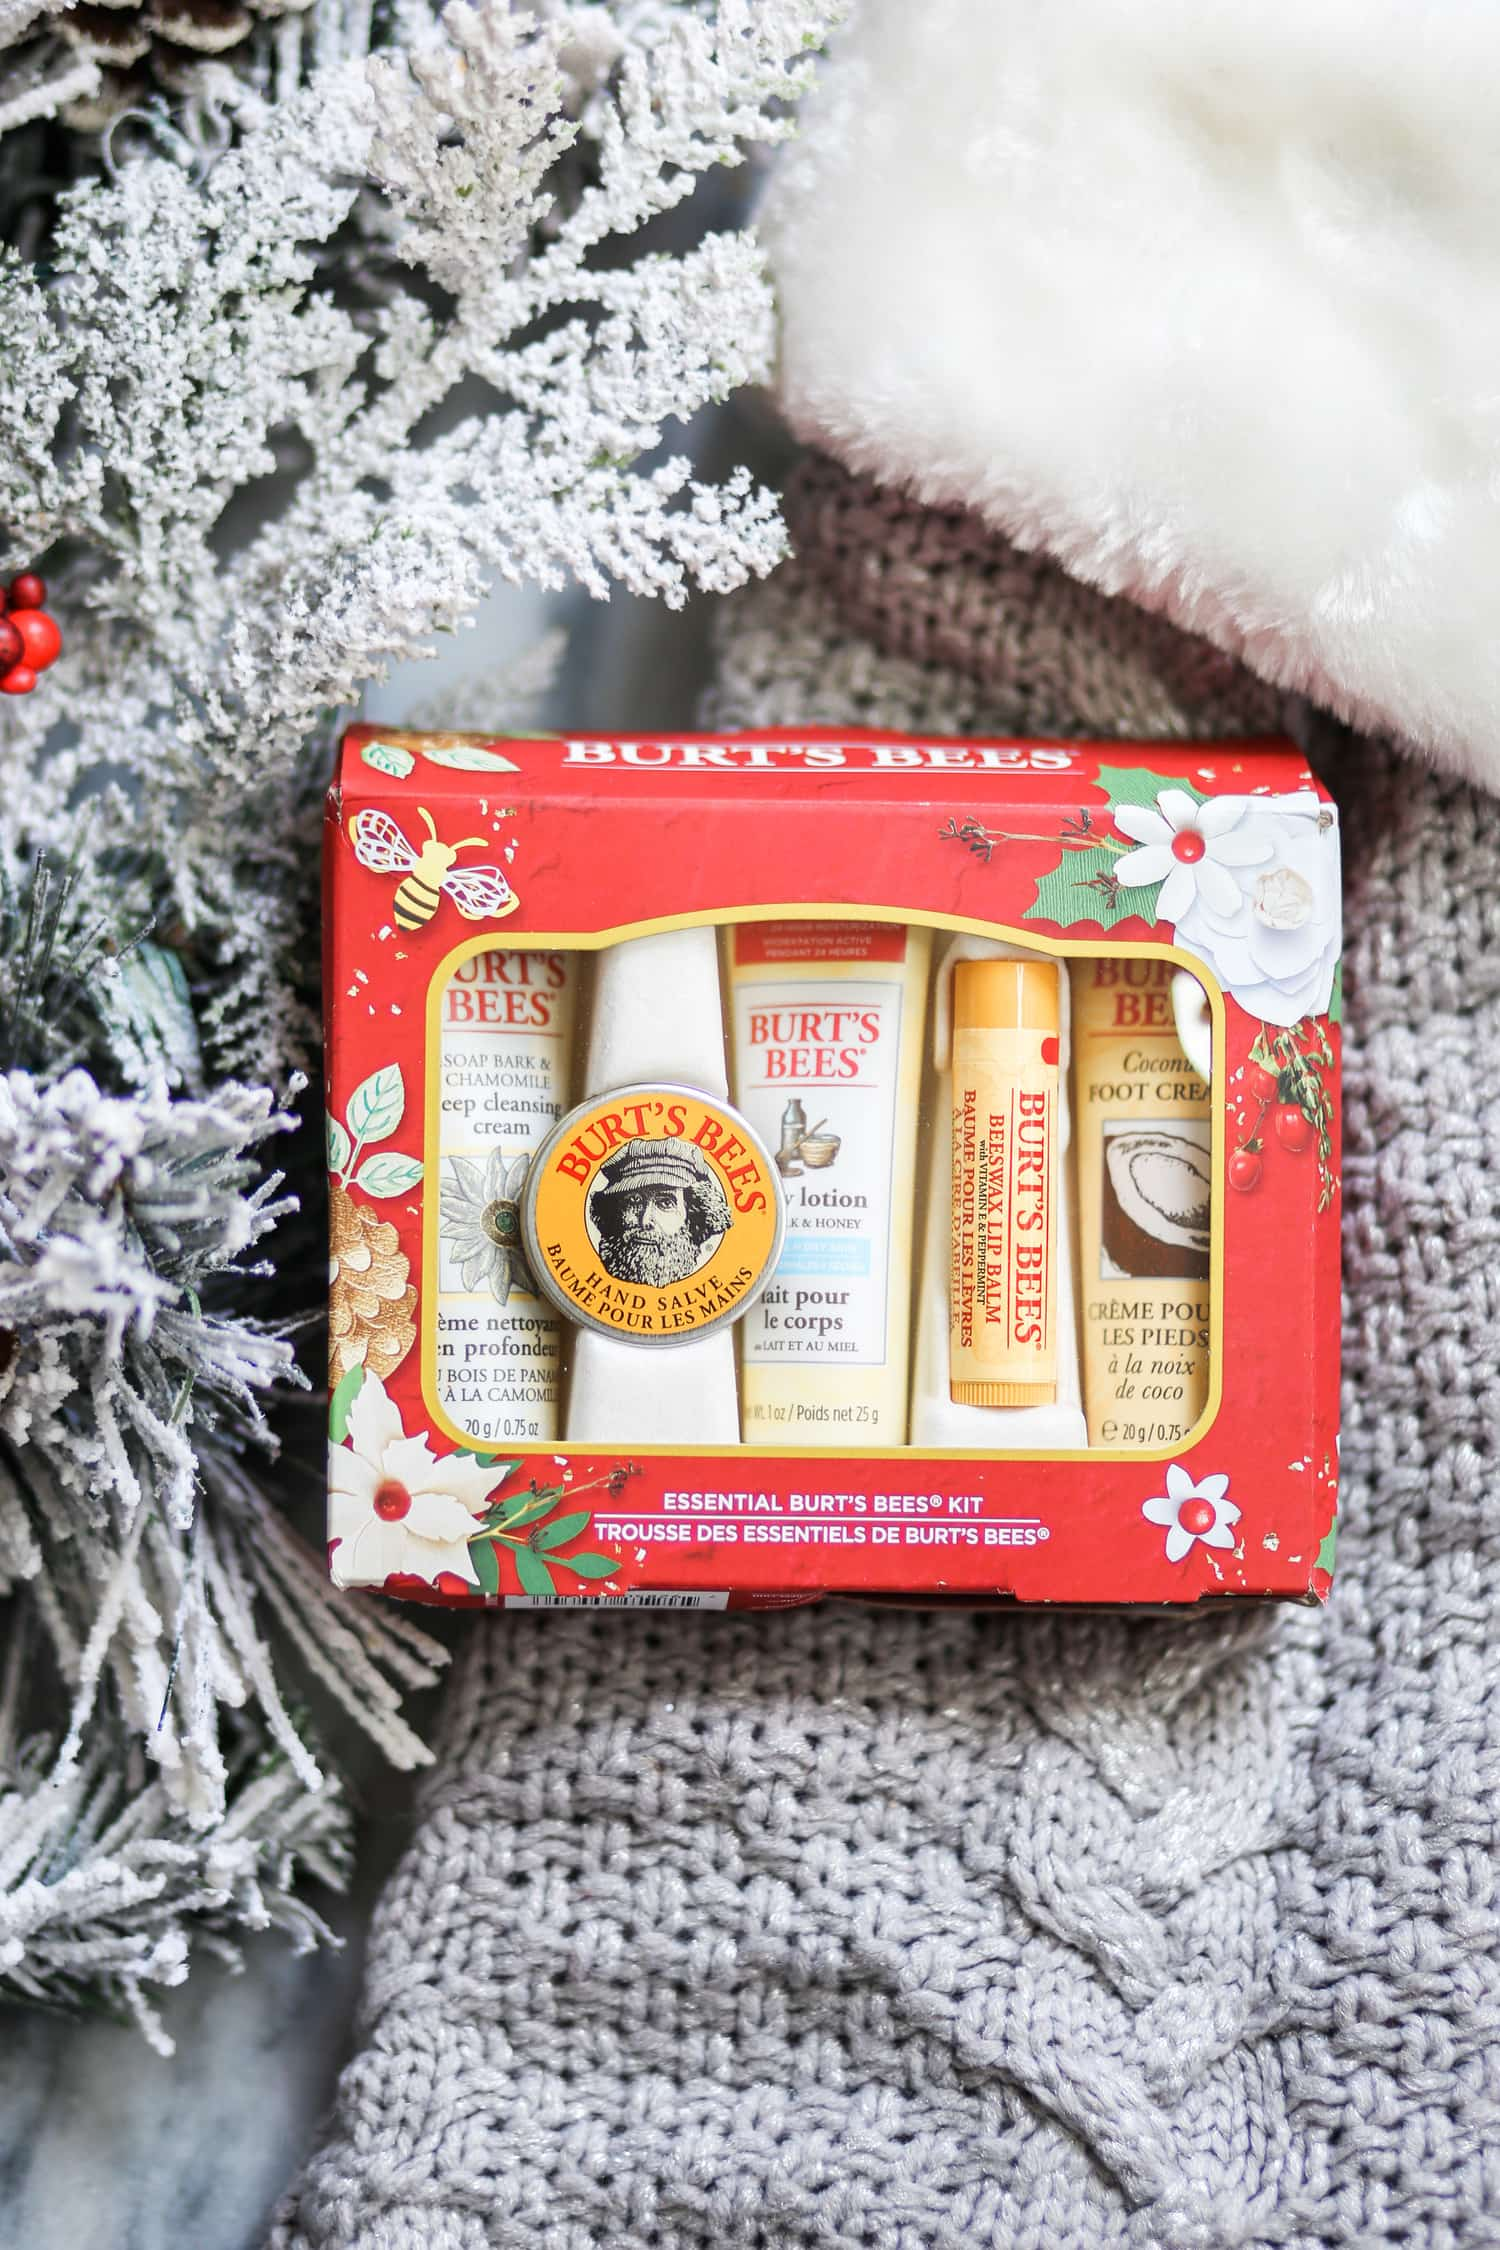 Burt's Bees Christmas gift ideas Christmas tree ornaments lip balm